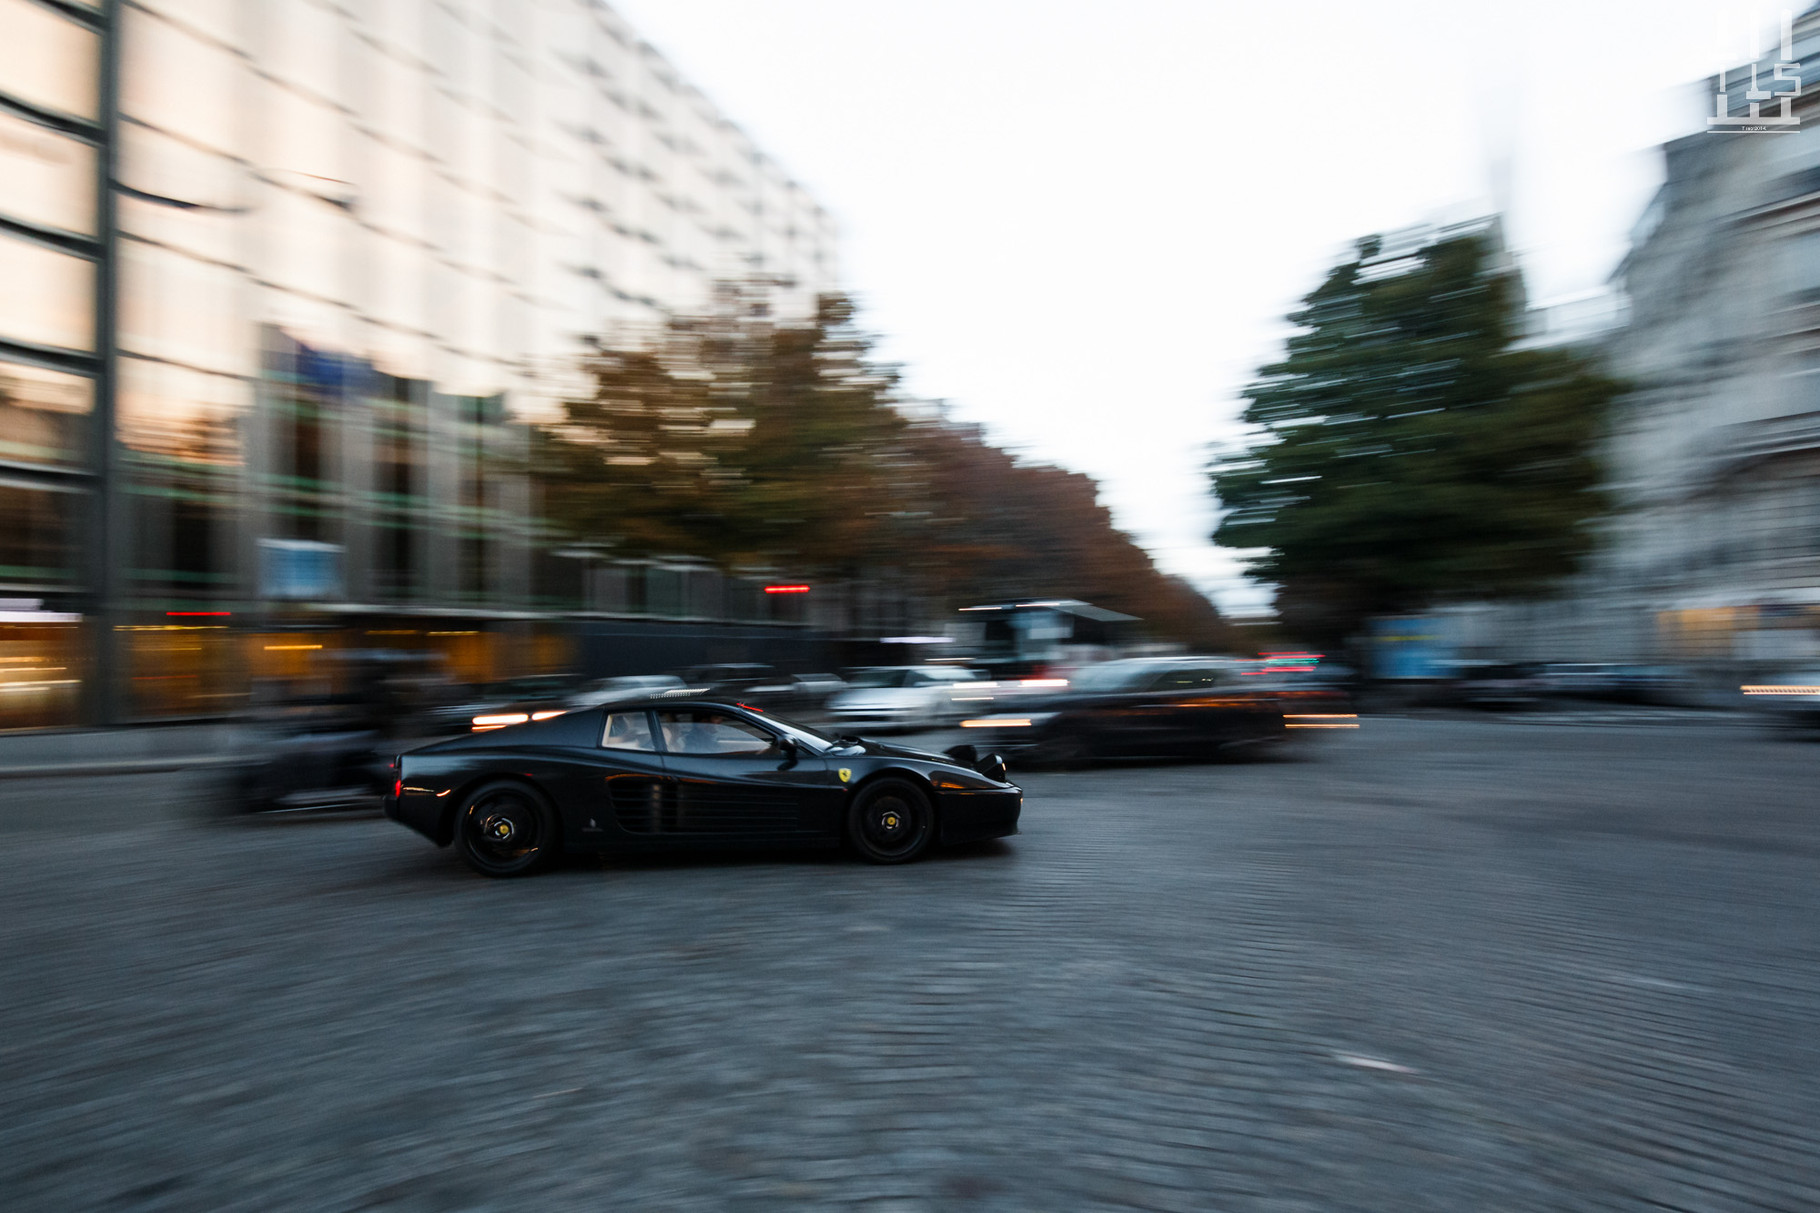 Ferrari 512 TR, avenue Pierre 1er de Serbie